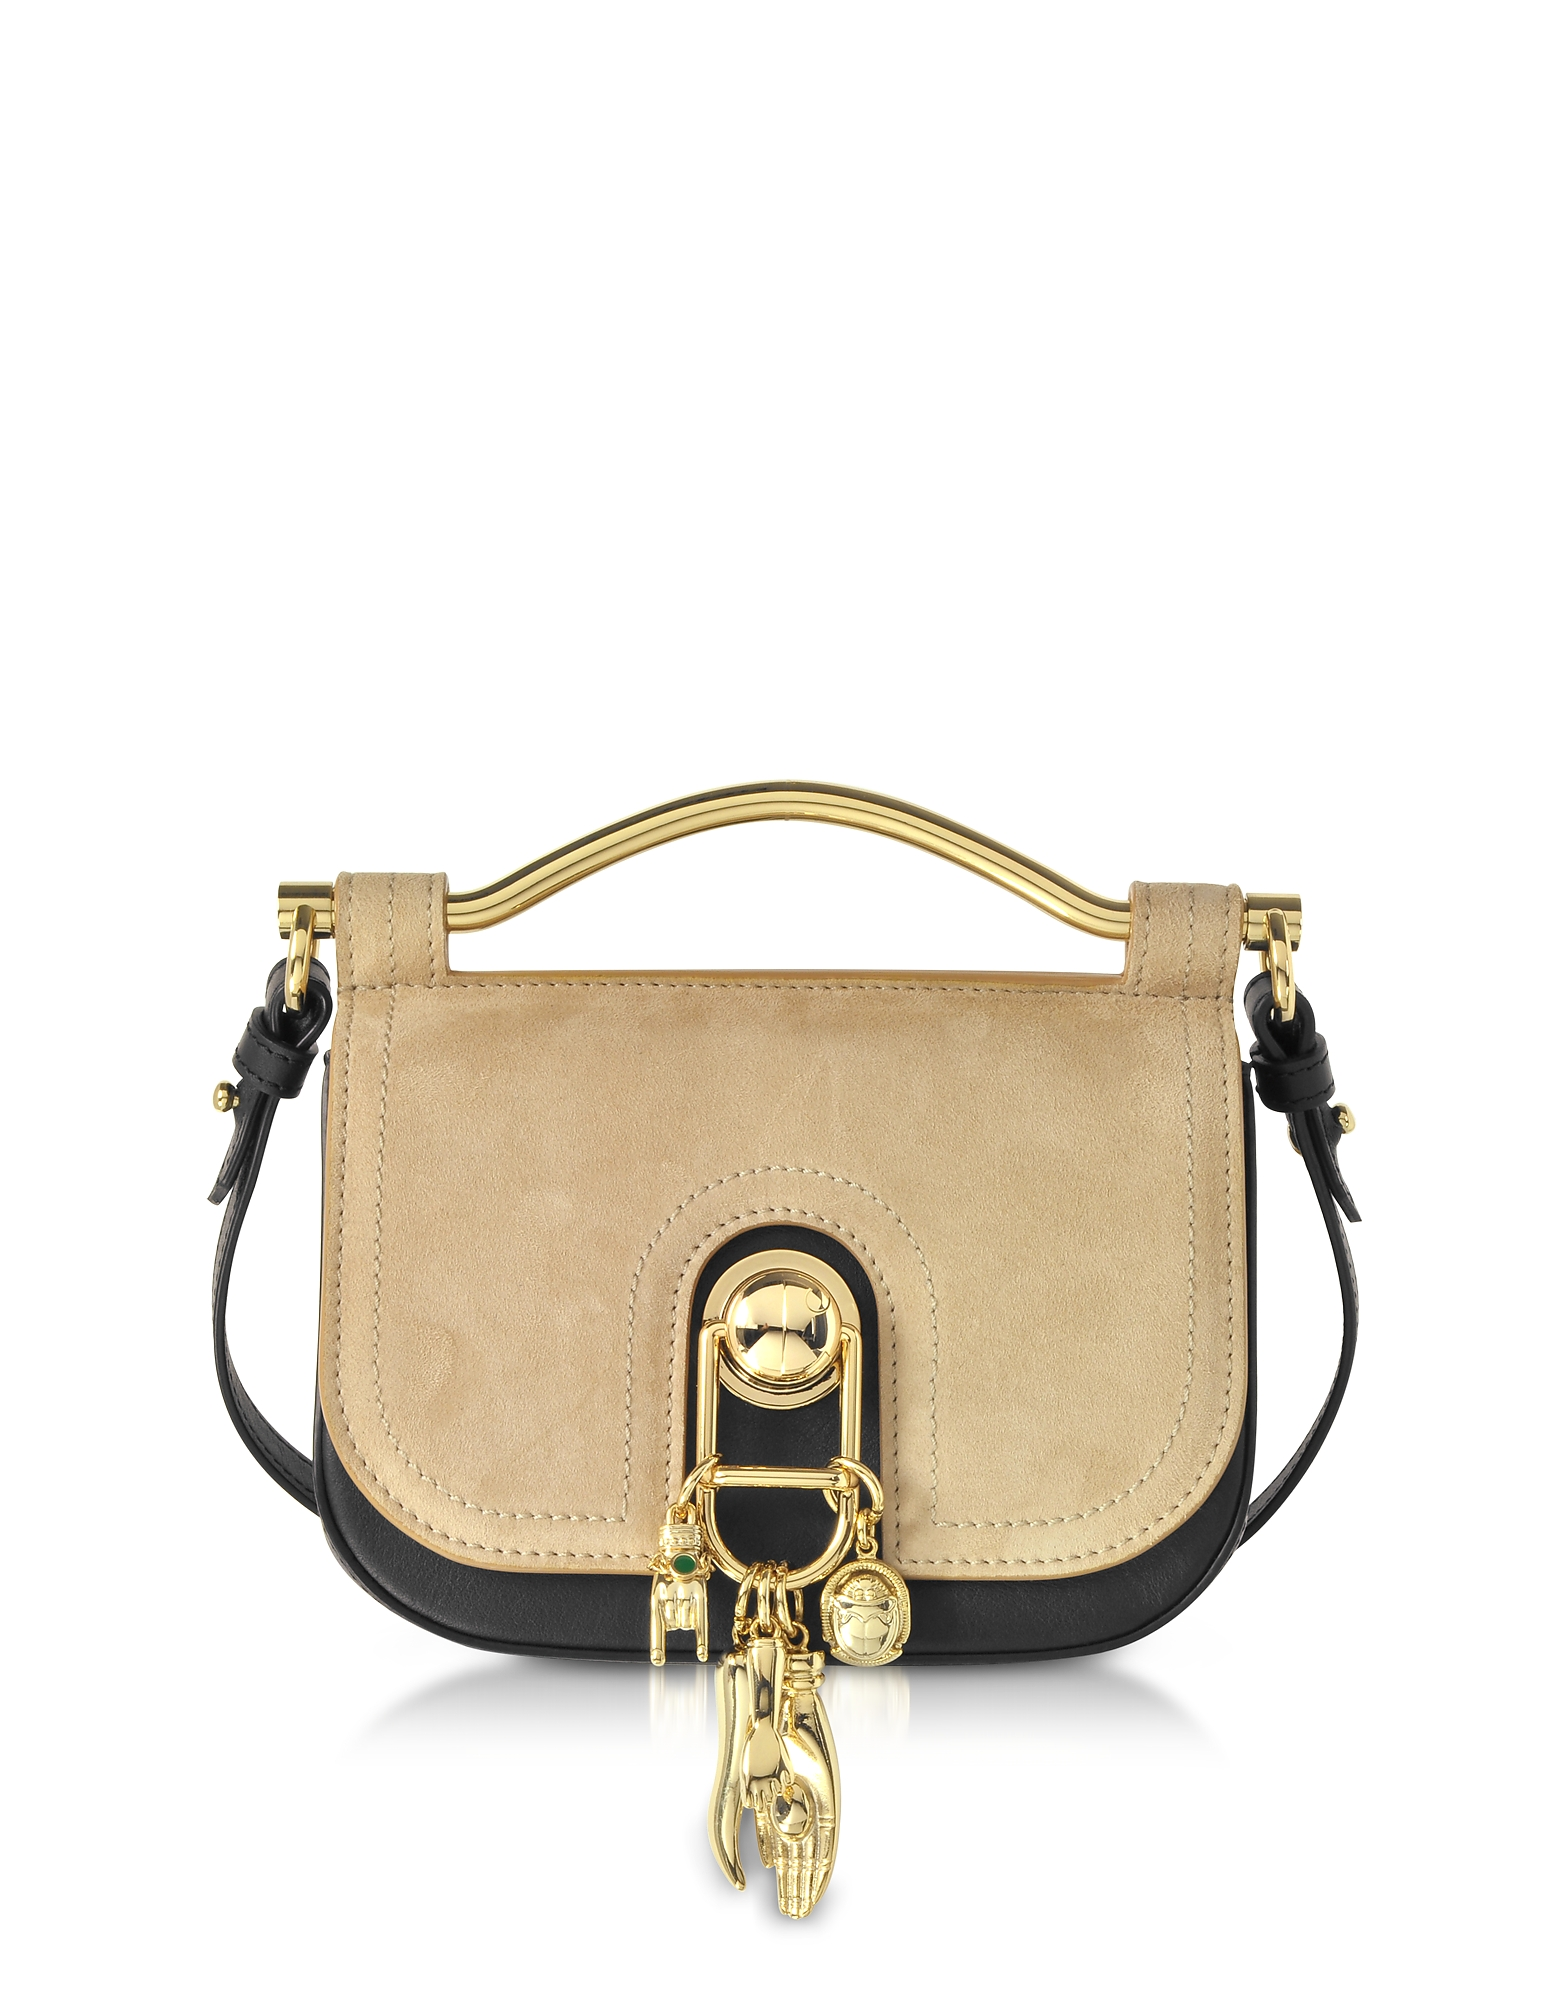 Carven Handbags, Suede and Leather Misti Crossbody Bag